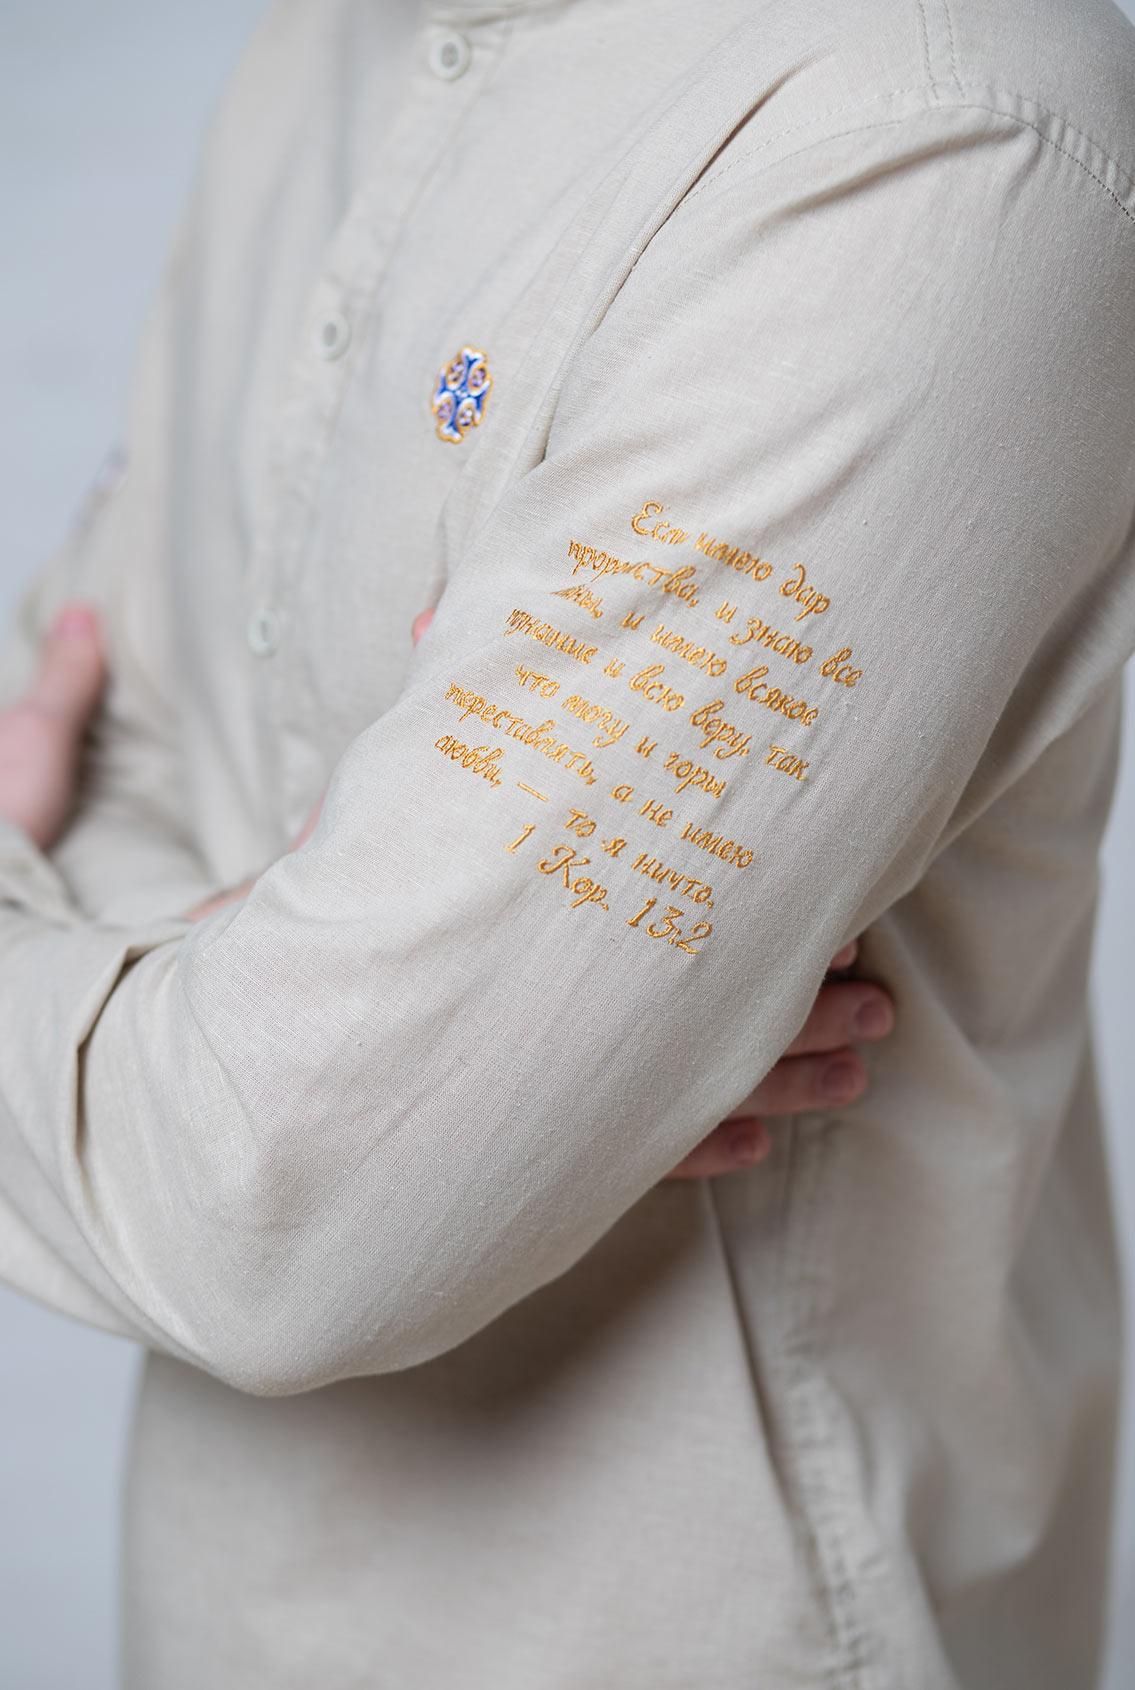 рубашка с синим крестом,  shirt with a blue cross